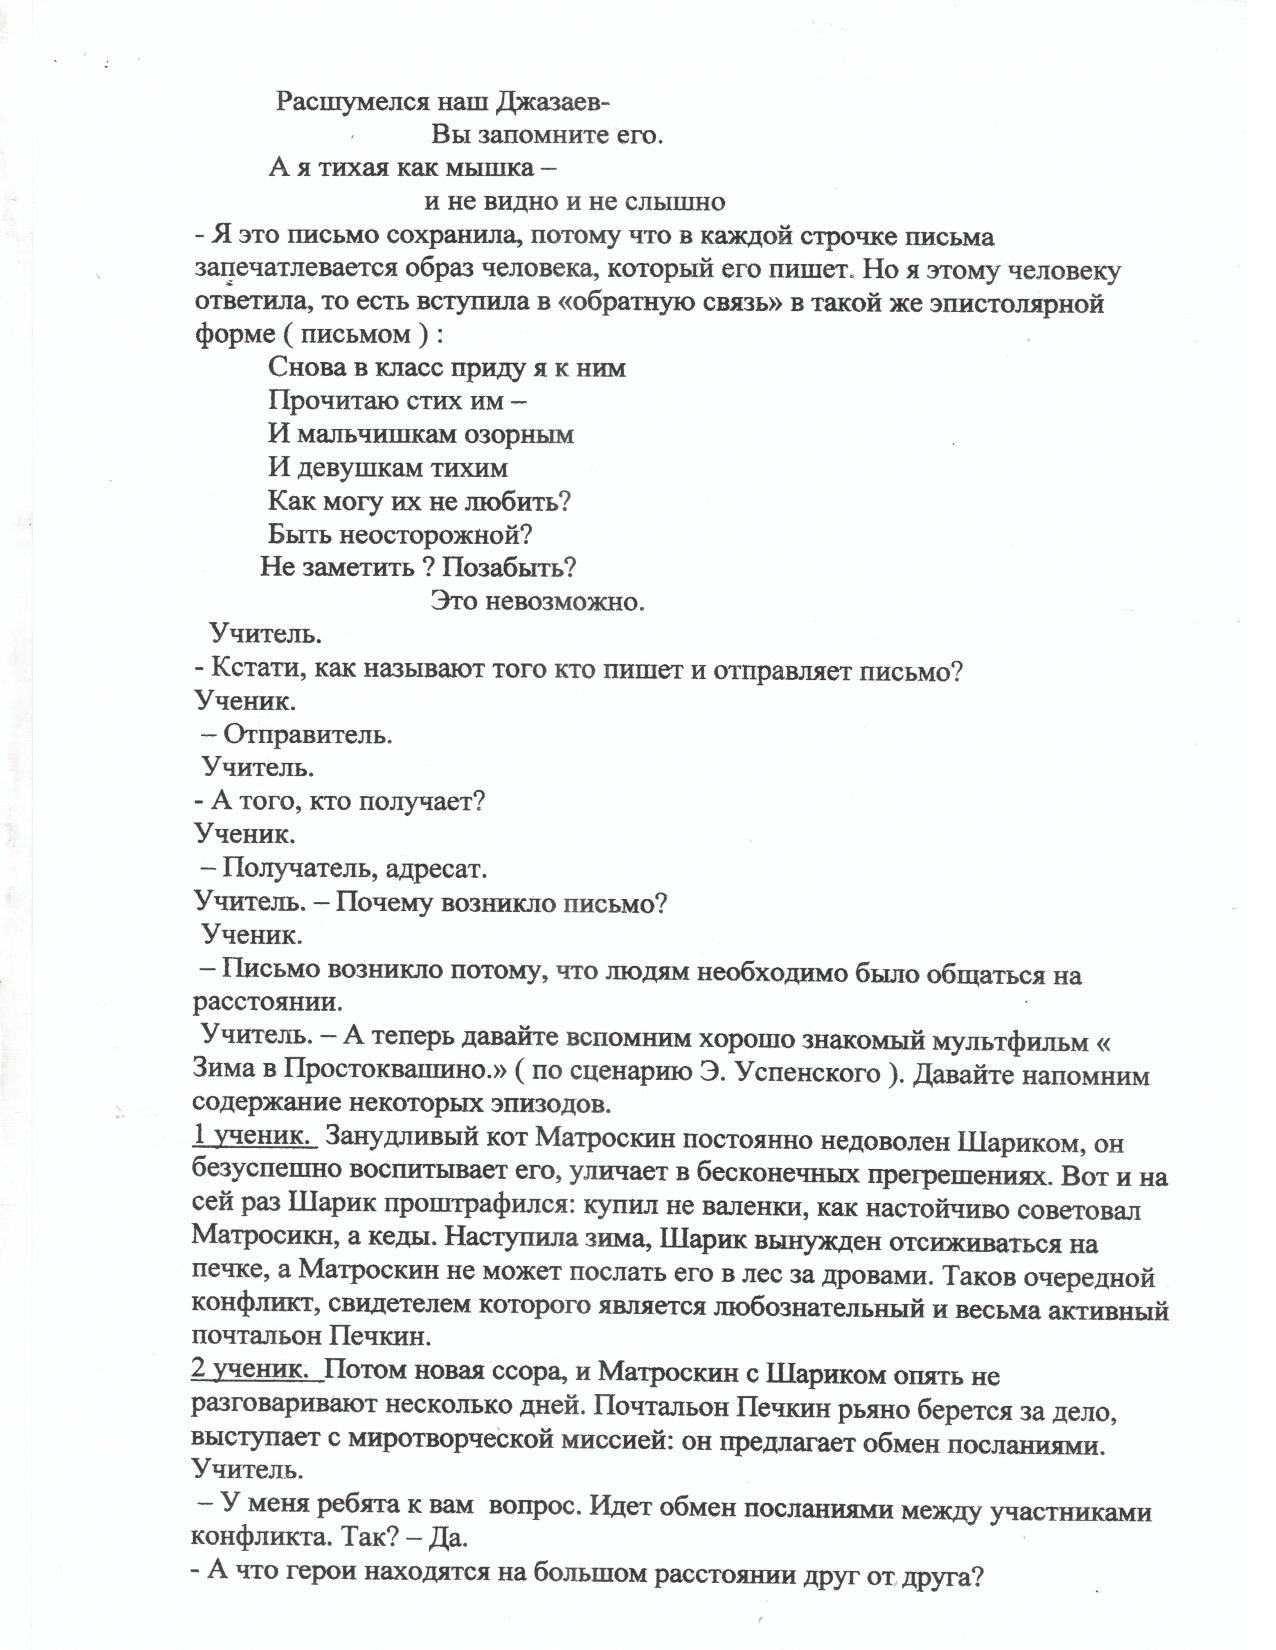 H:\сканер работ\Урок письма\стр3.jpg